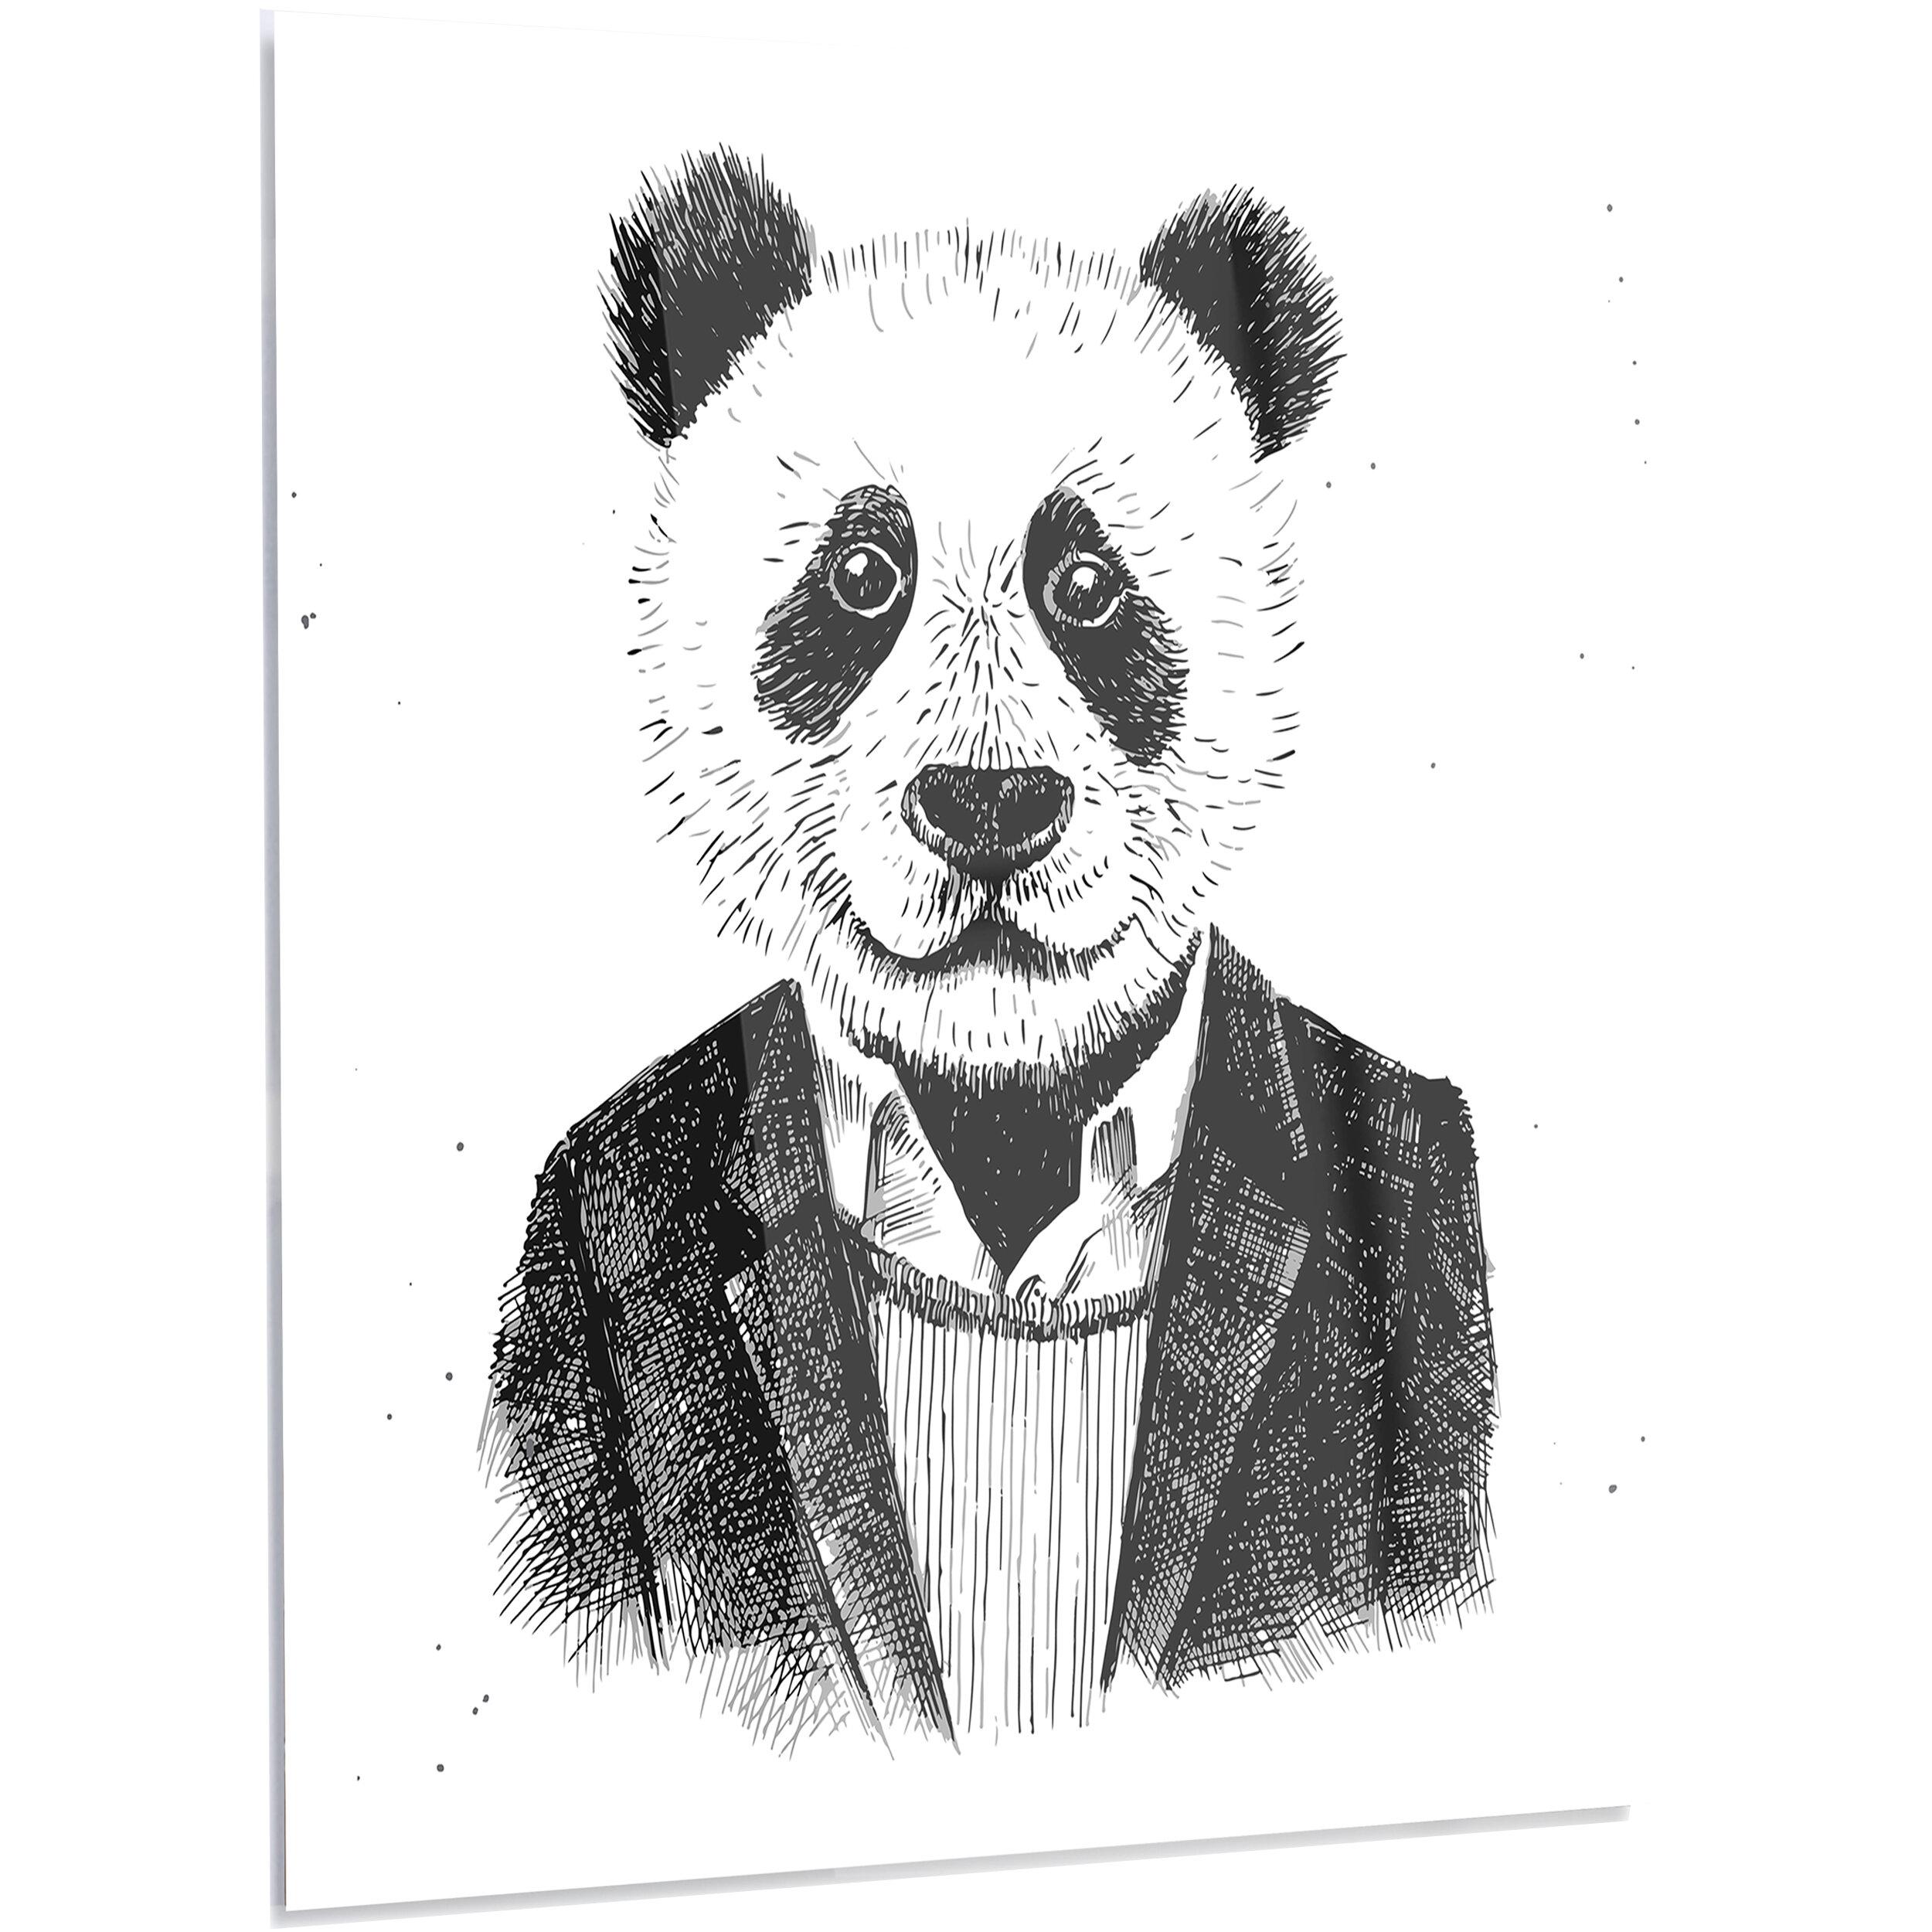 Designart Funny Hipster Panda Black White Graphic Art On